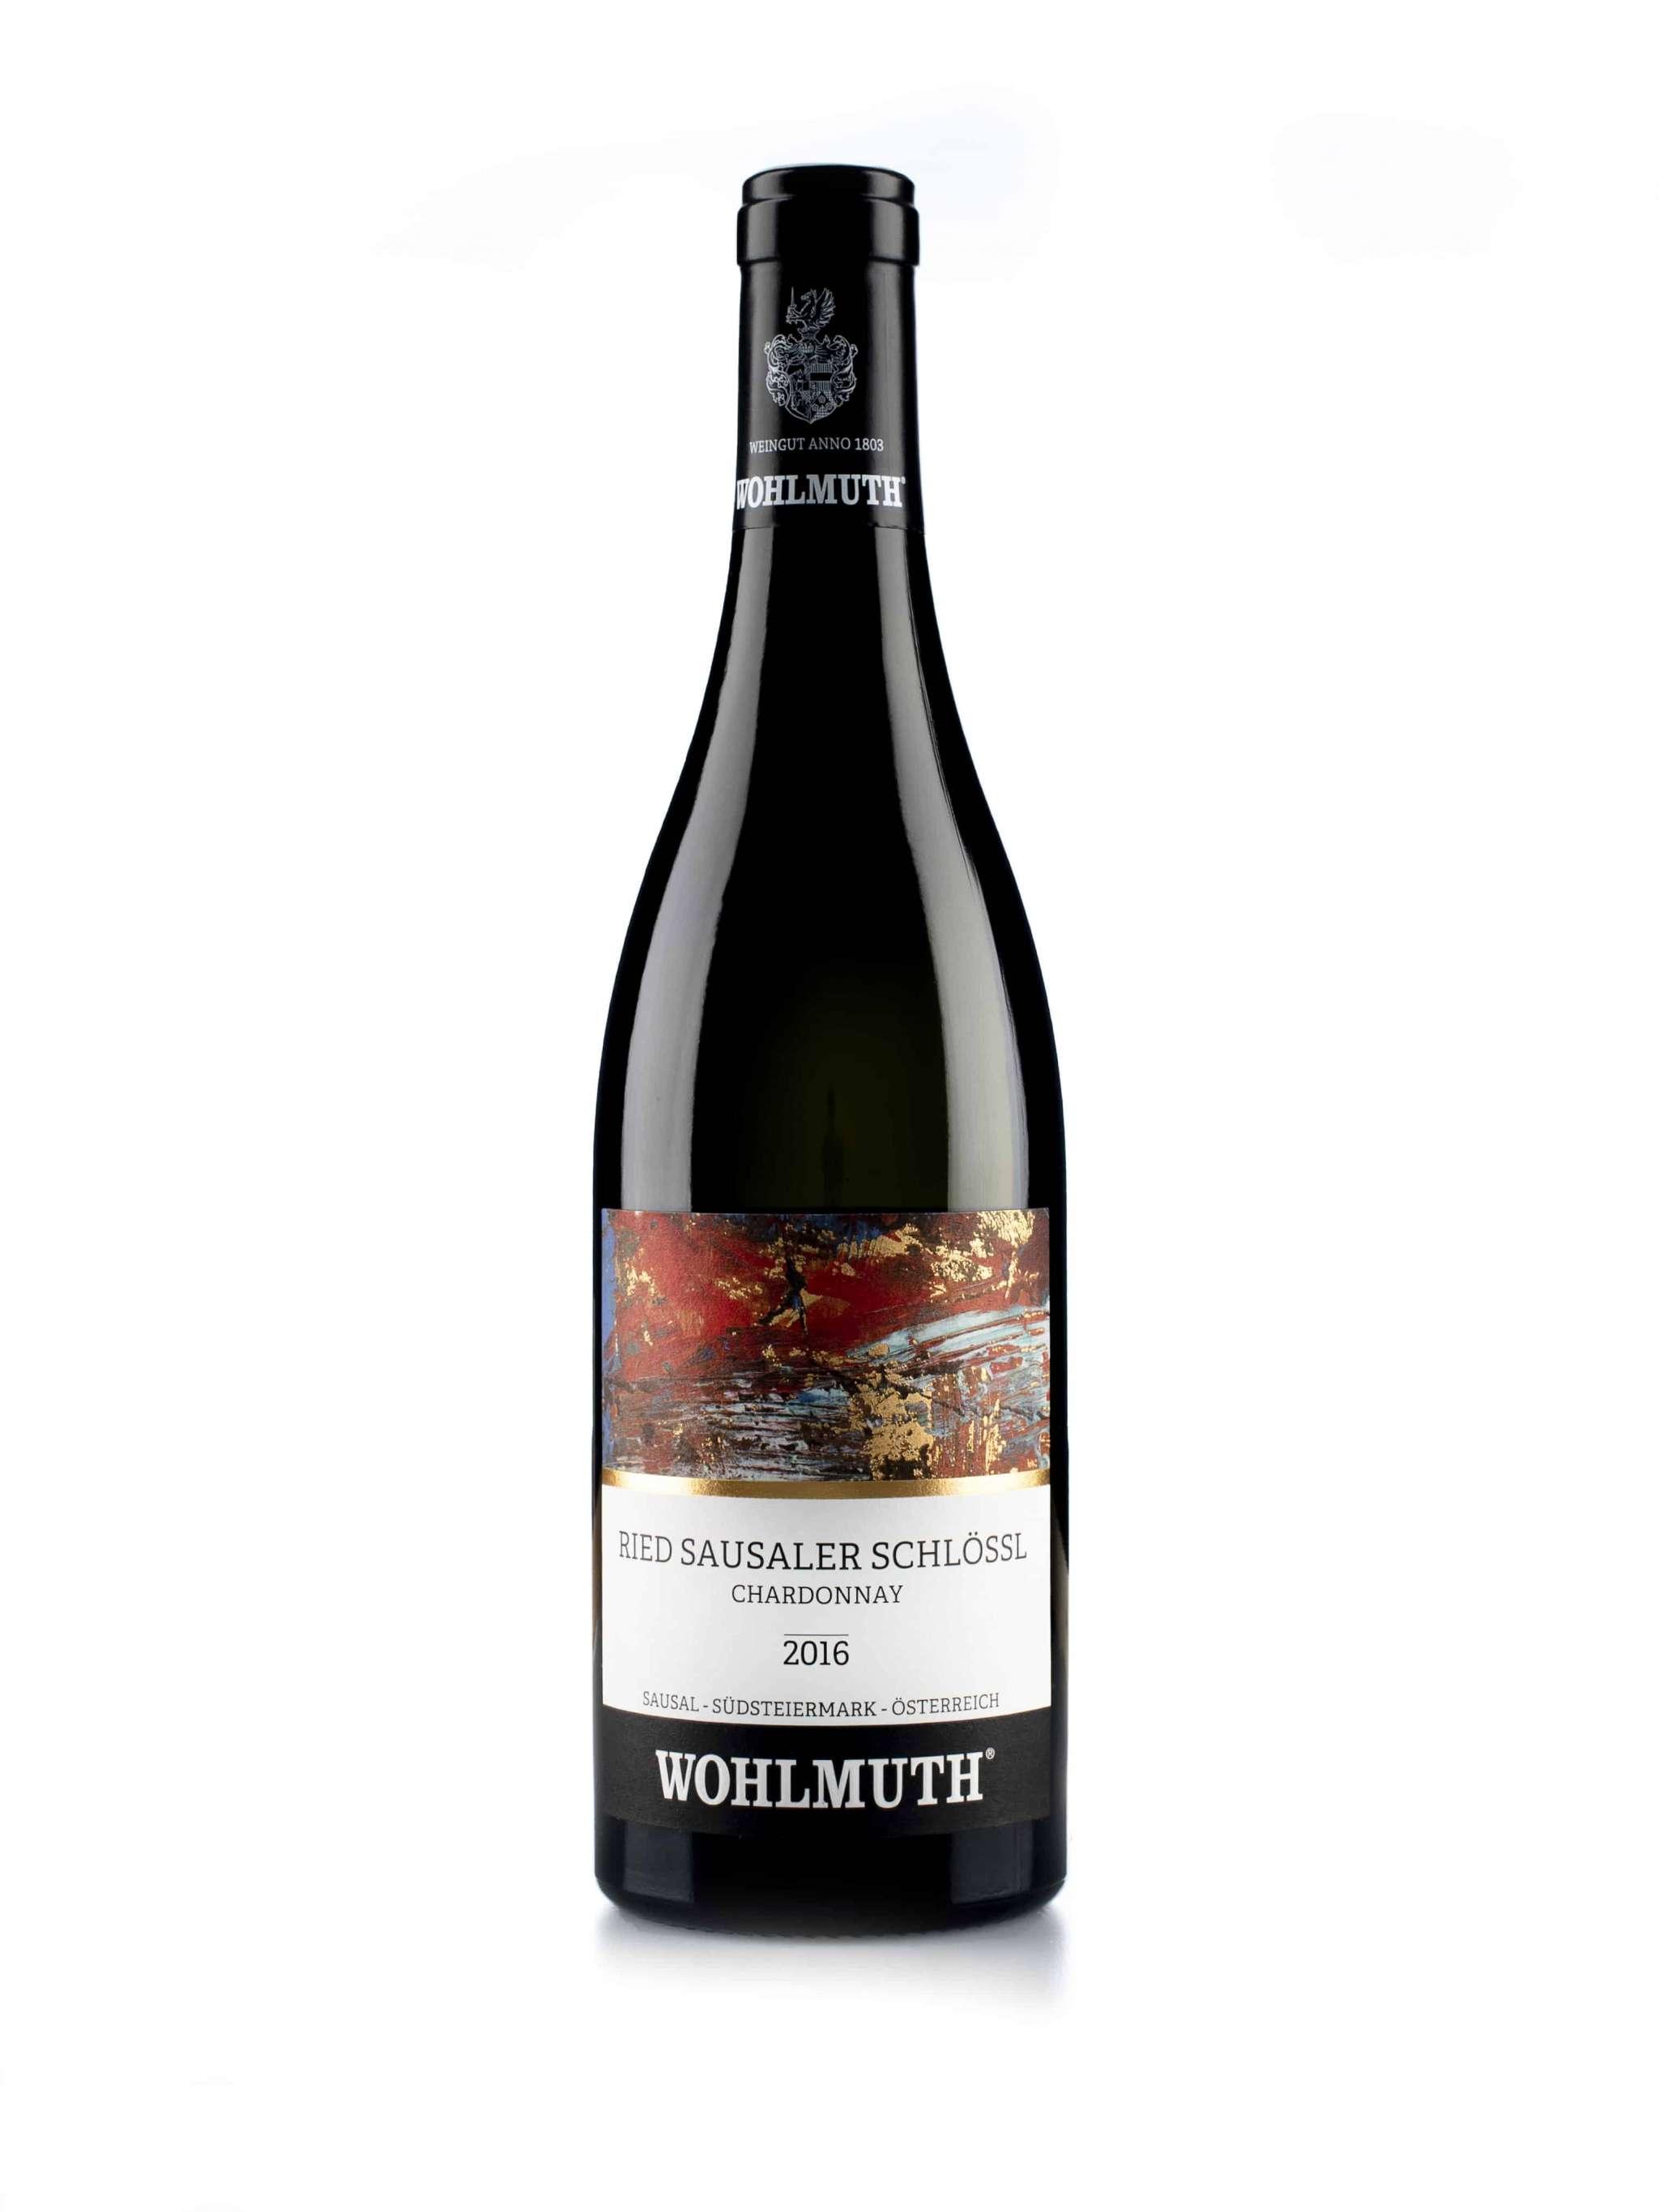 Oostenrijkse rode wijn van wijndomein Wohlmuth: Chardonnay 'Ried Saudal Schlosl'